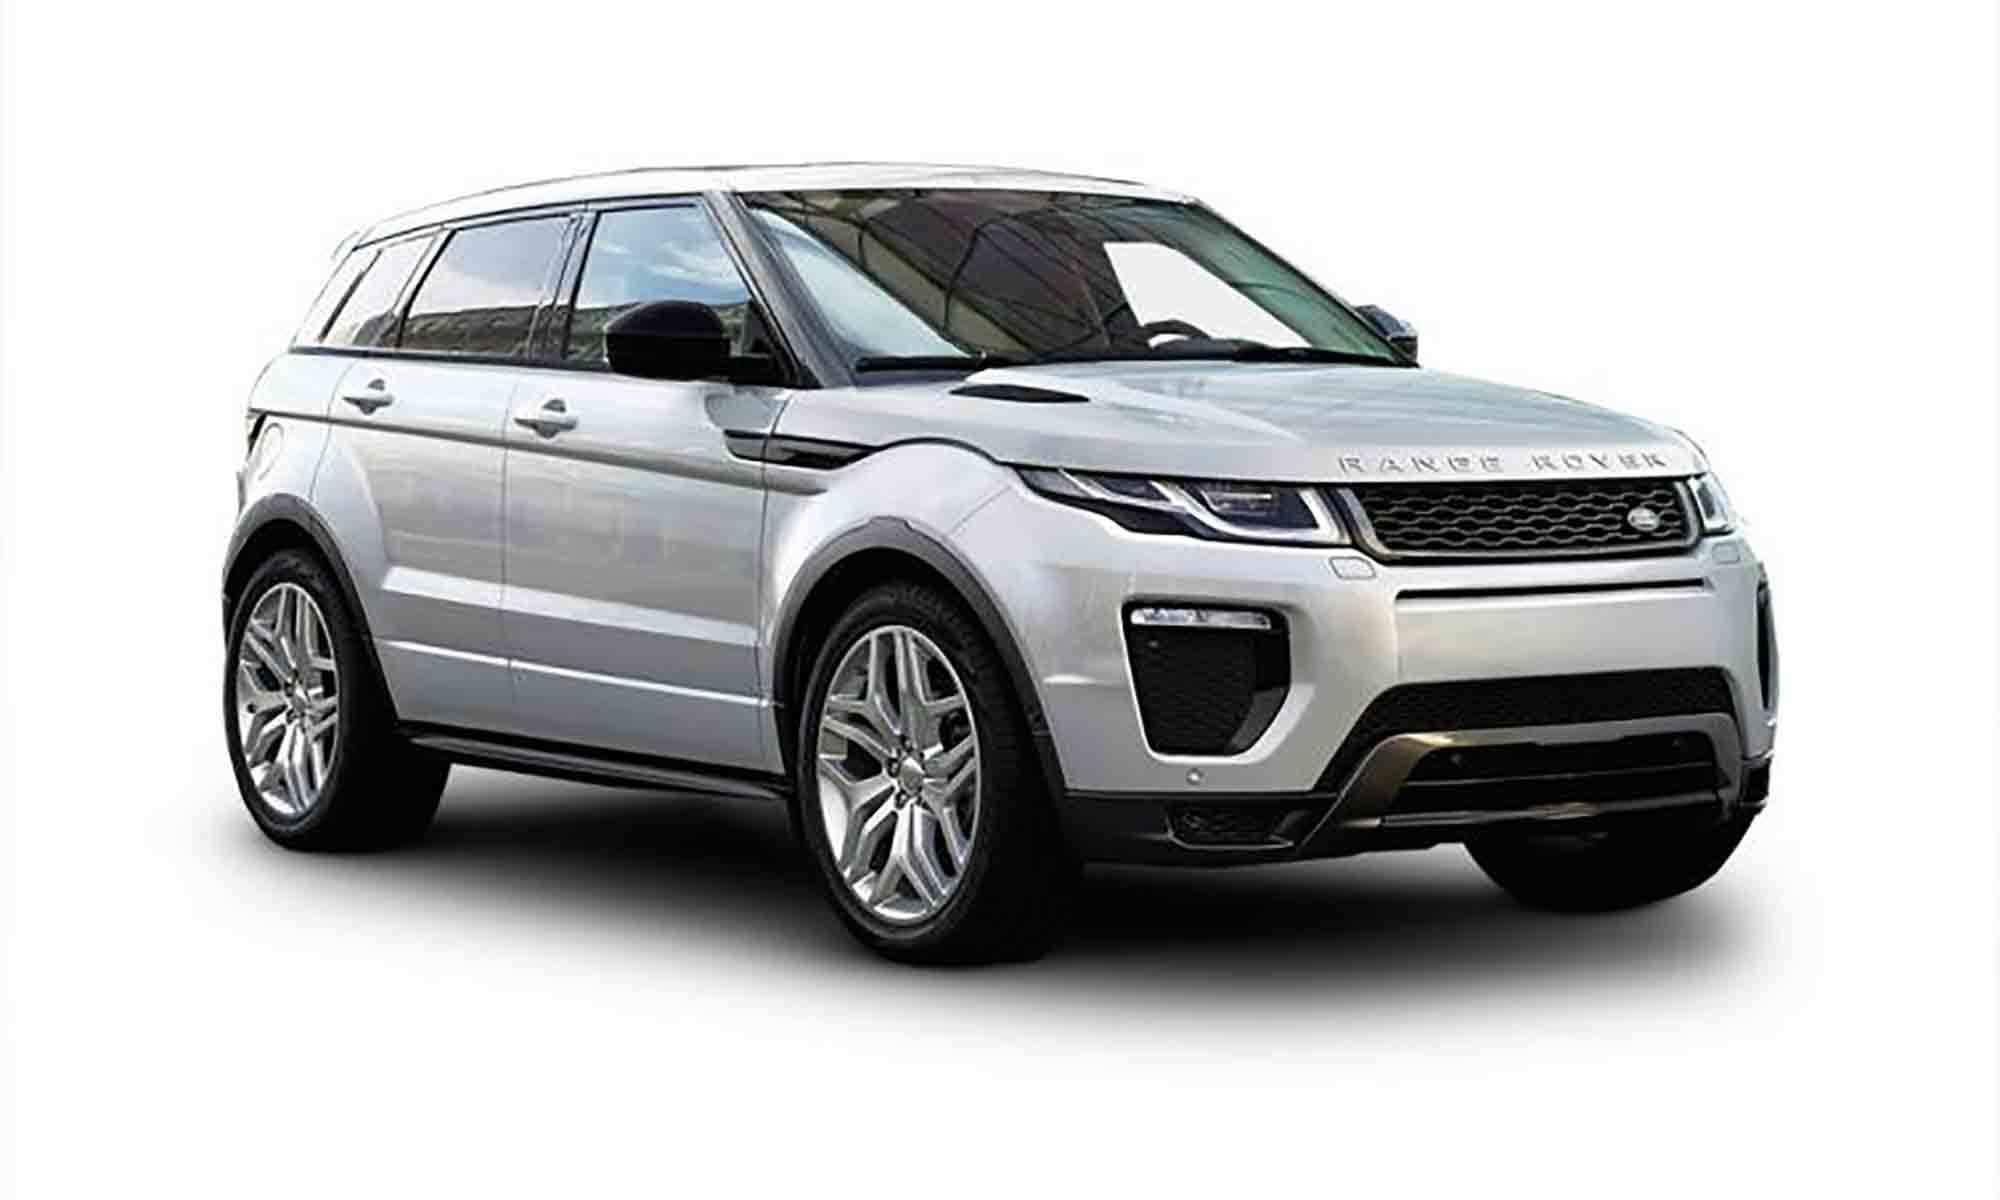 Range Rover Evoque White Background